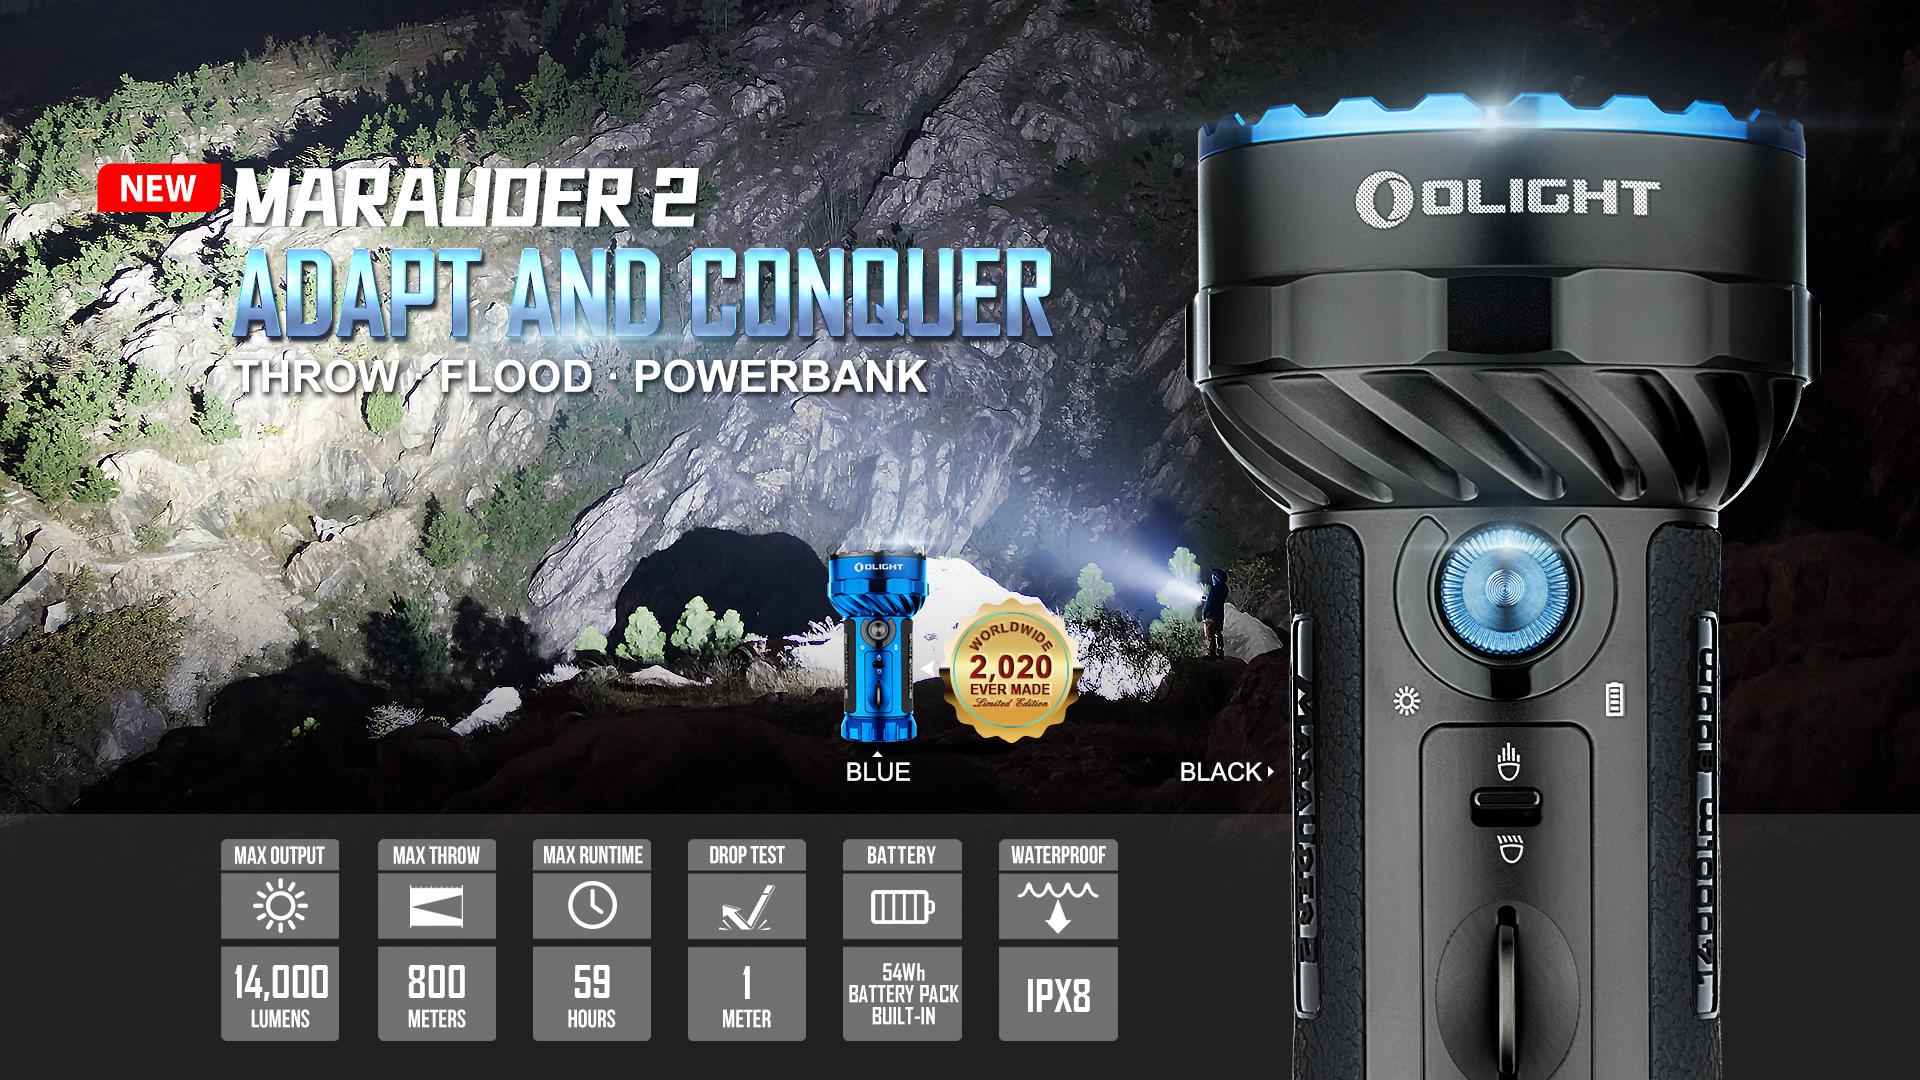 Marauder 2 high lumen powerful flashlight parameter